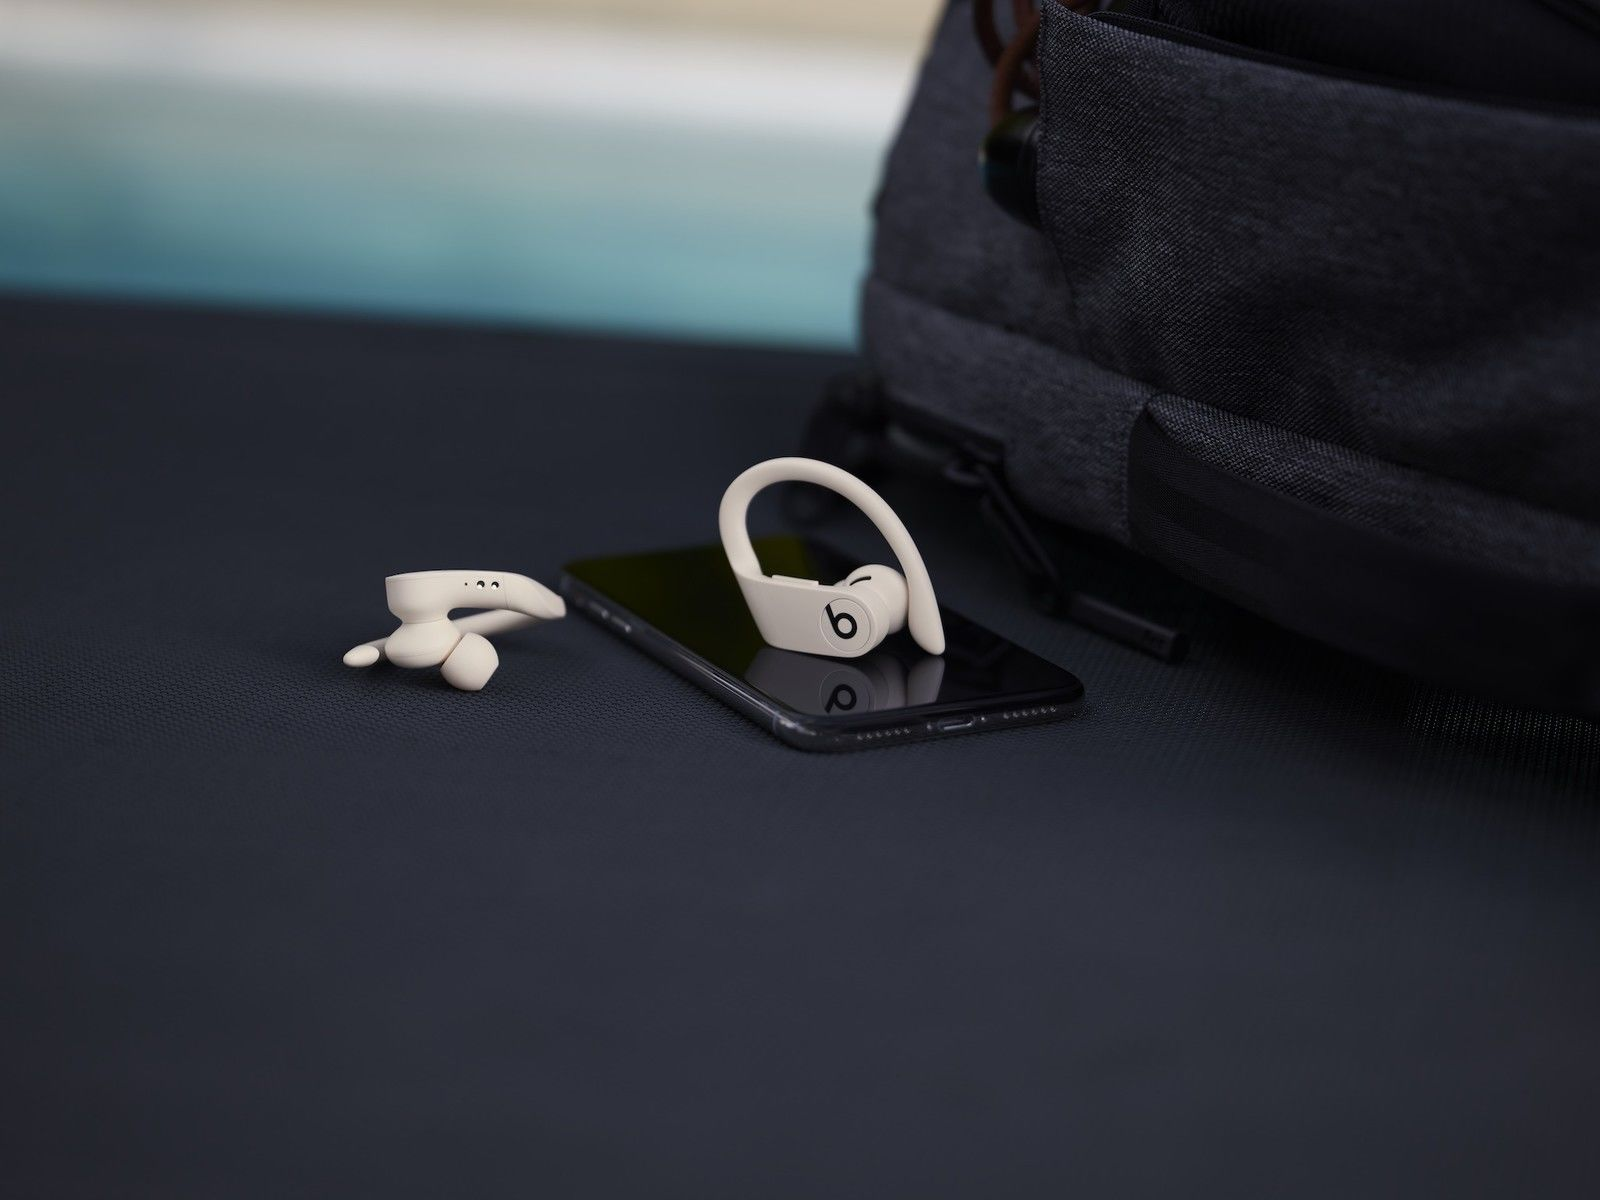 QnA VBage 苹果发新款 Beats 无线耳机,售 1888 元;刘强东旗下公司回应章泽天卸任董事;ofo 否认破产传闻